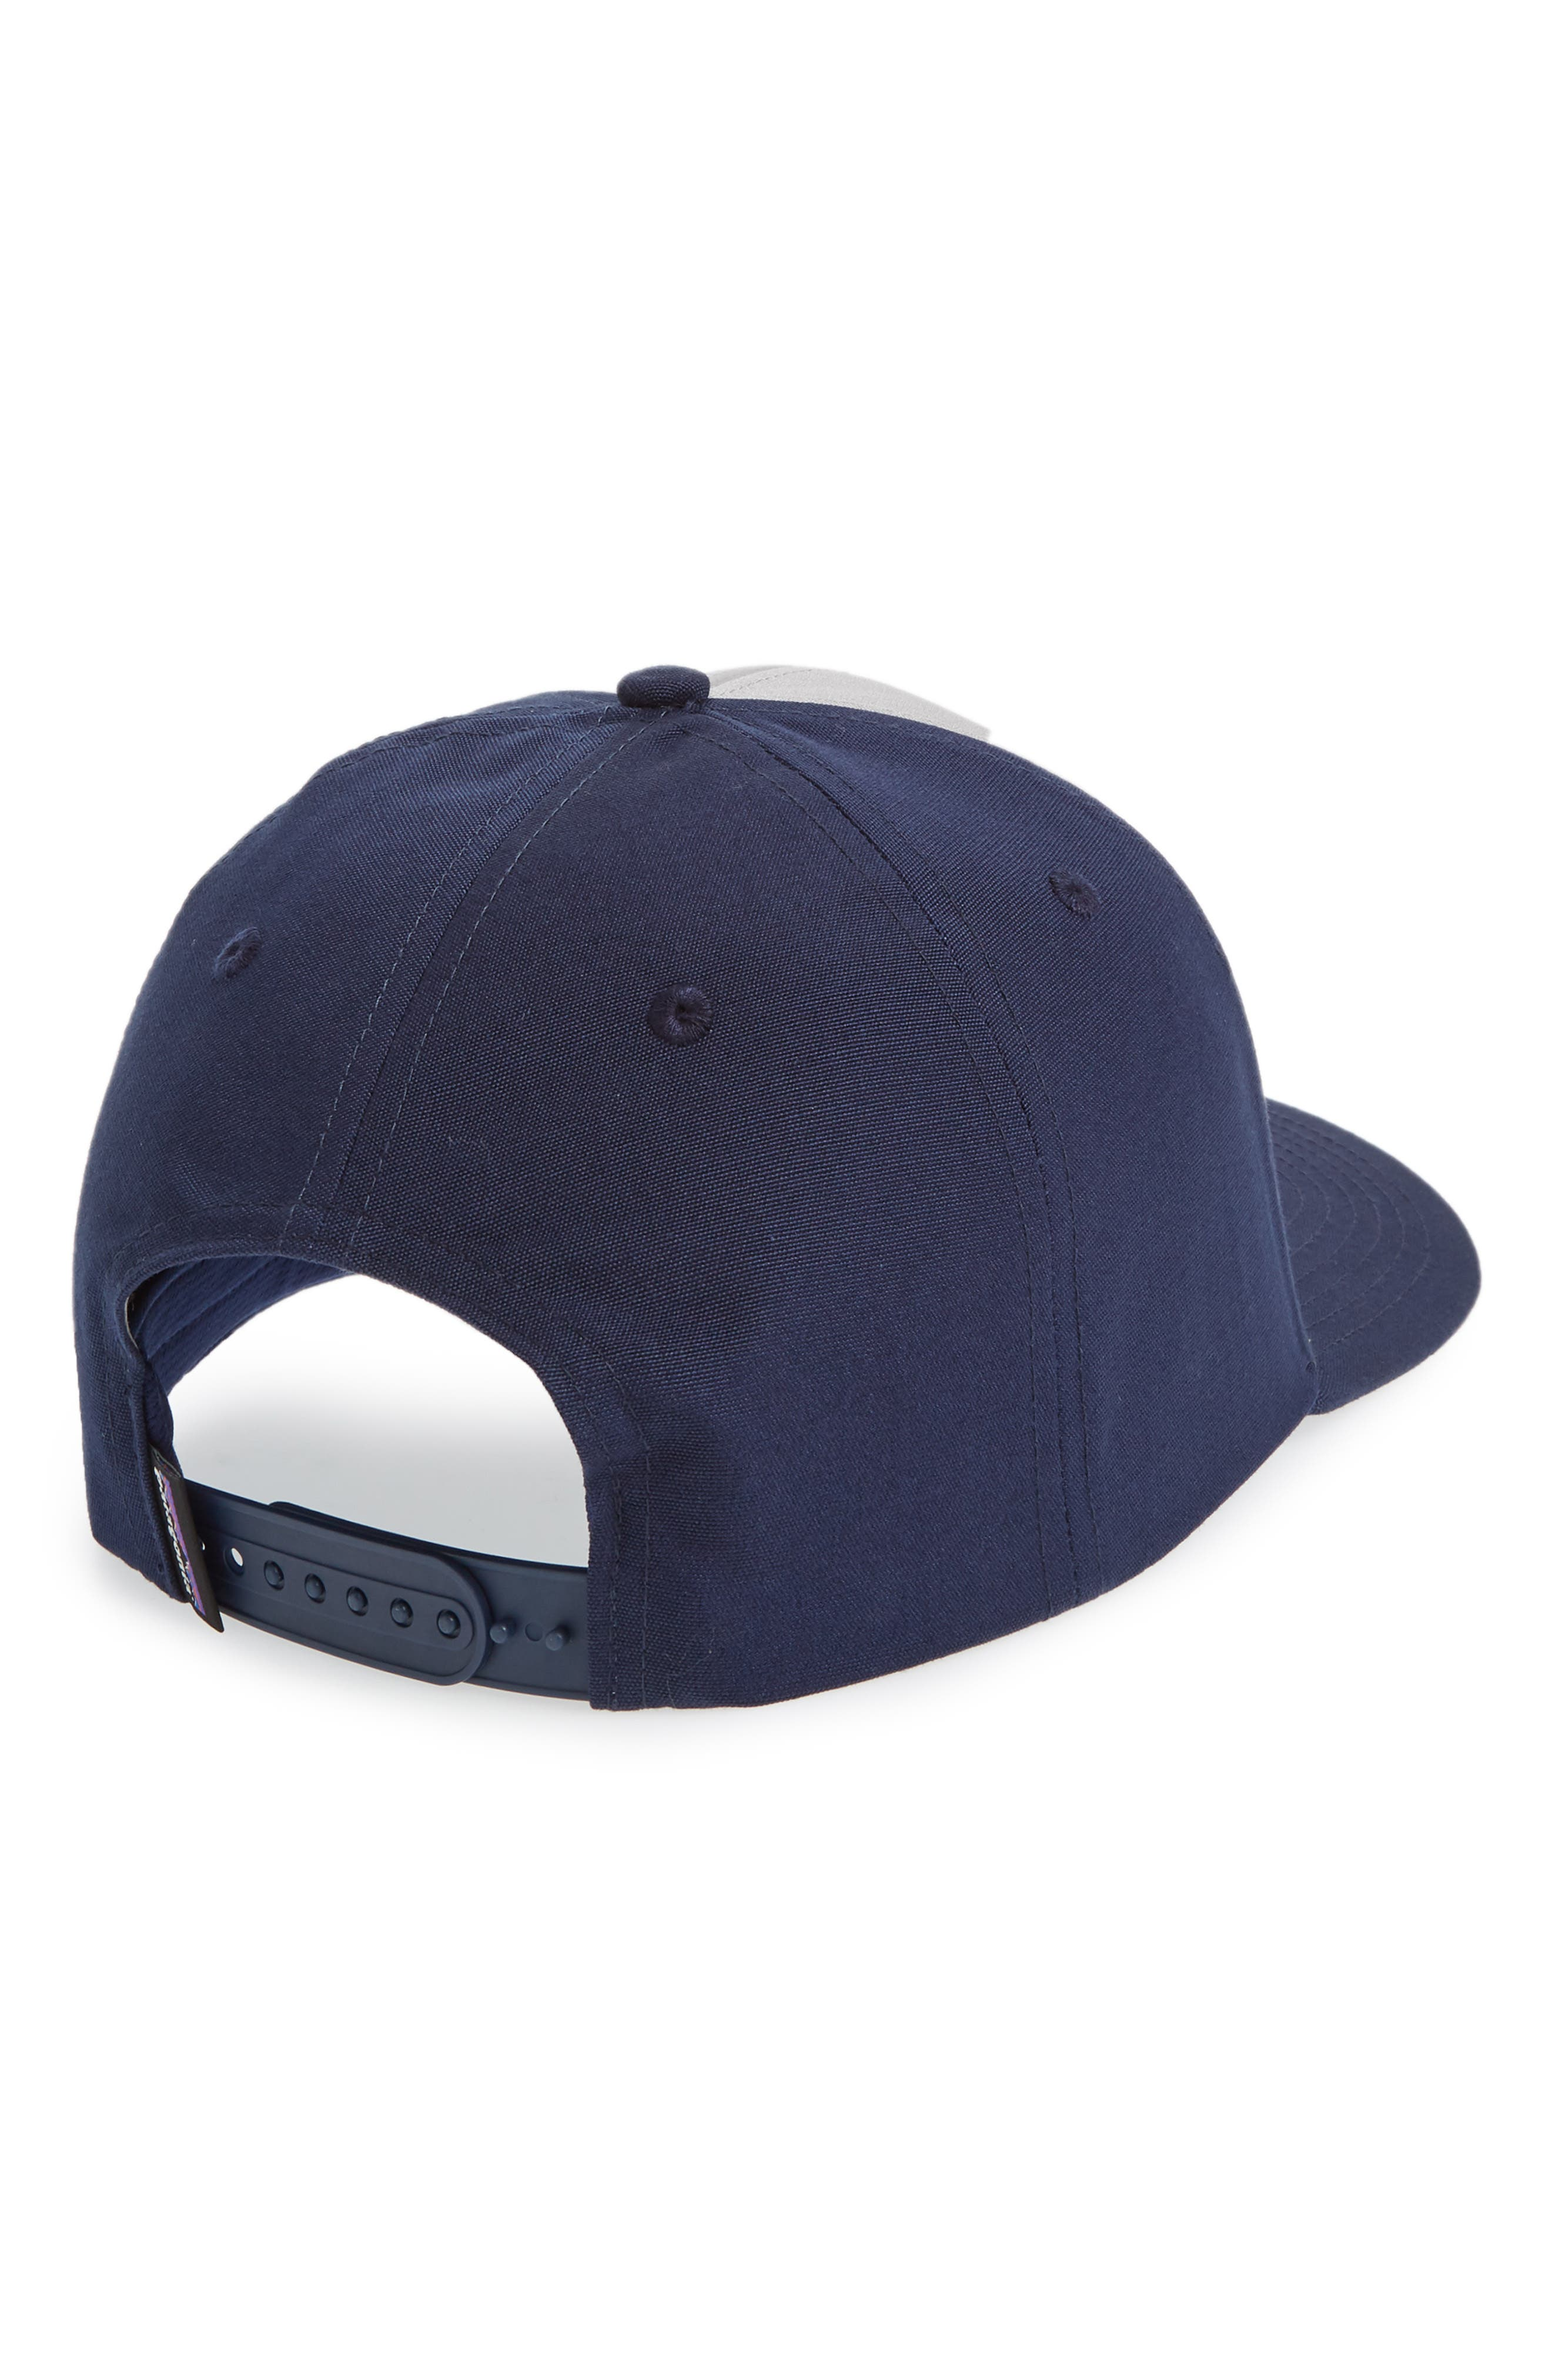 Live Simply Baseball Cap,                             Alternate thumbnail 2, color,                             020